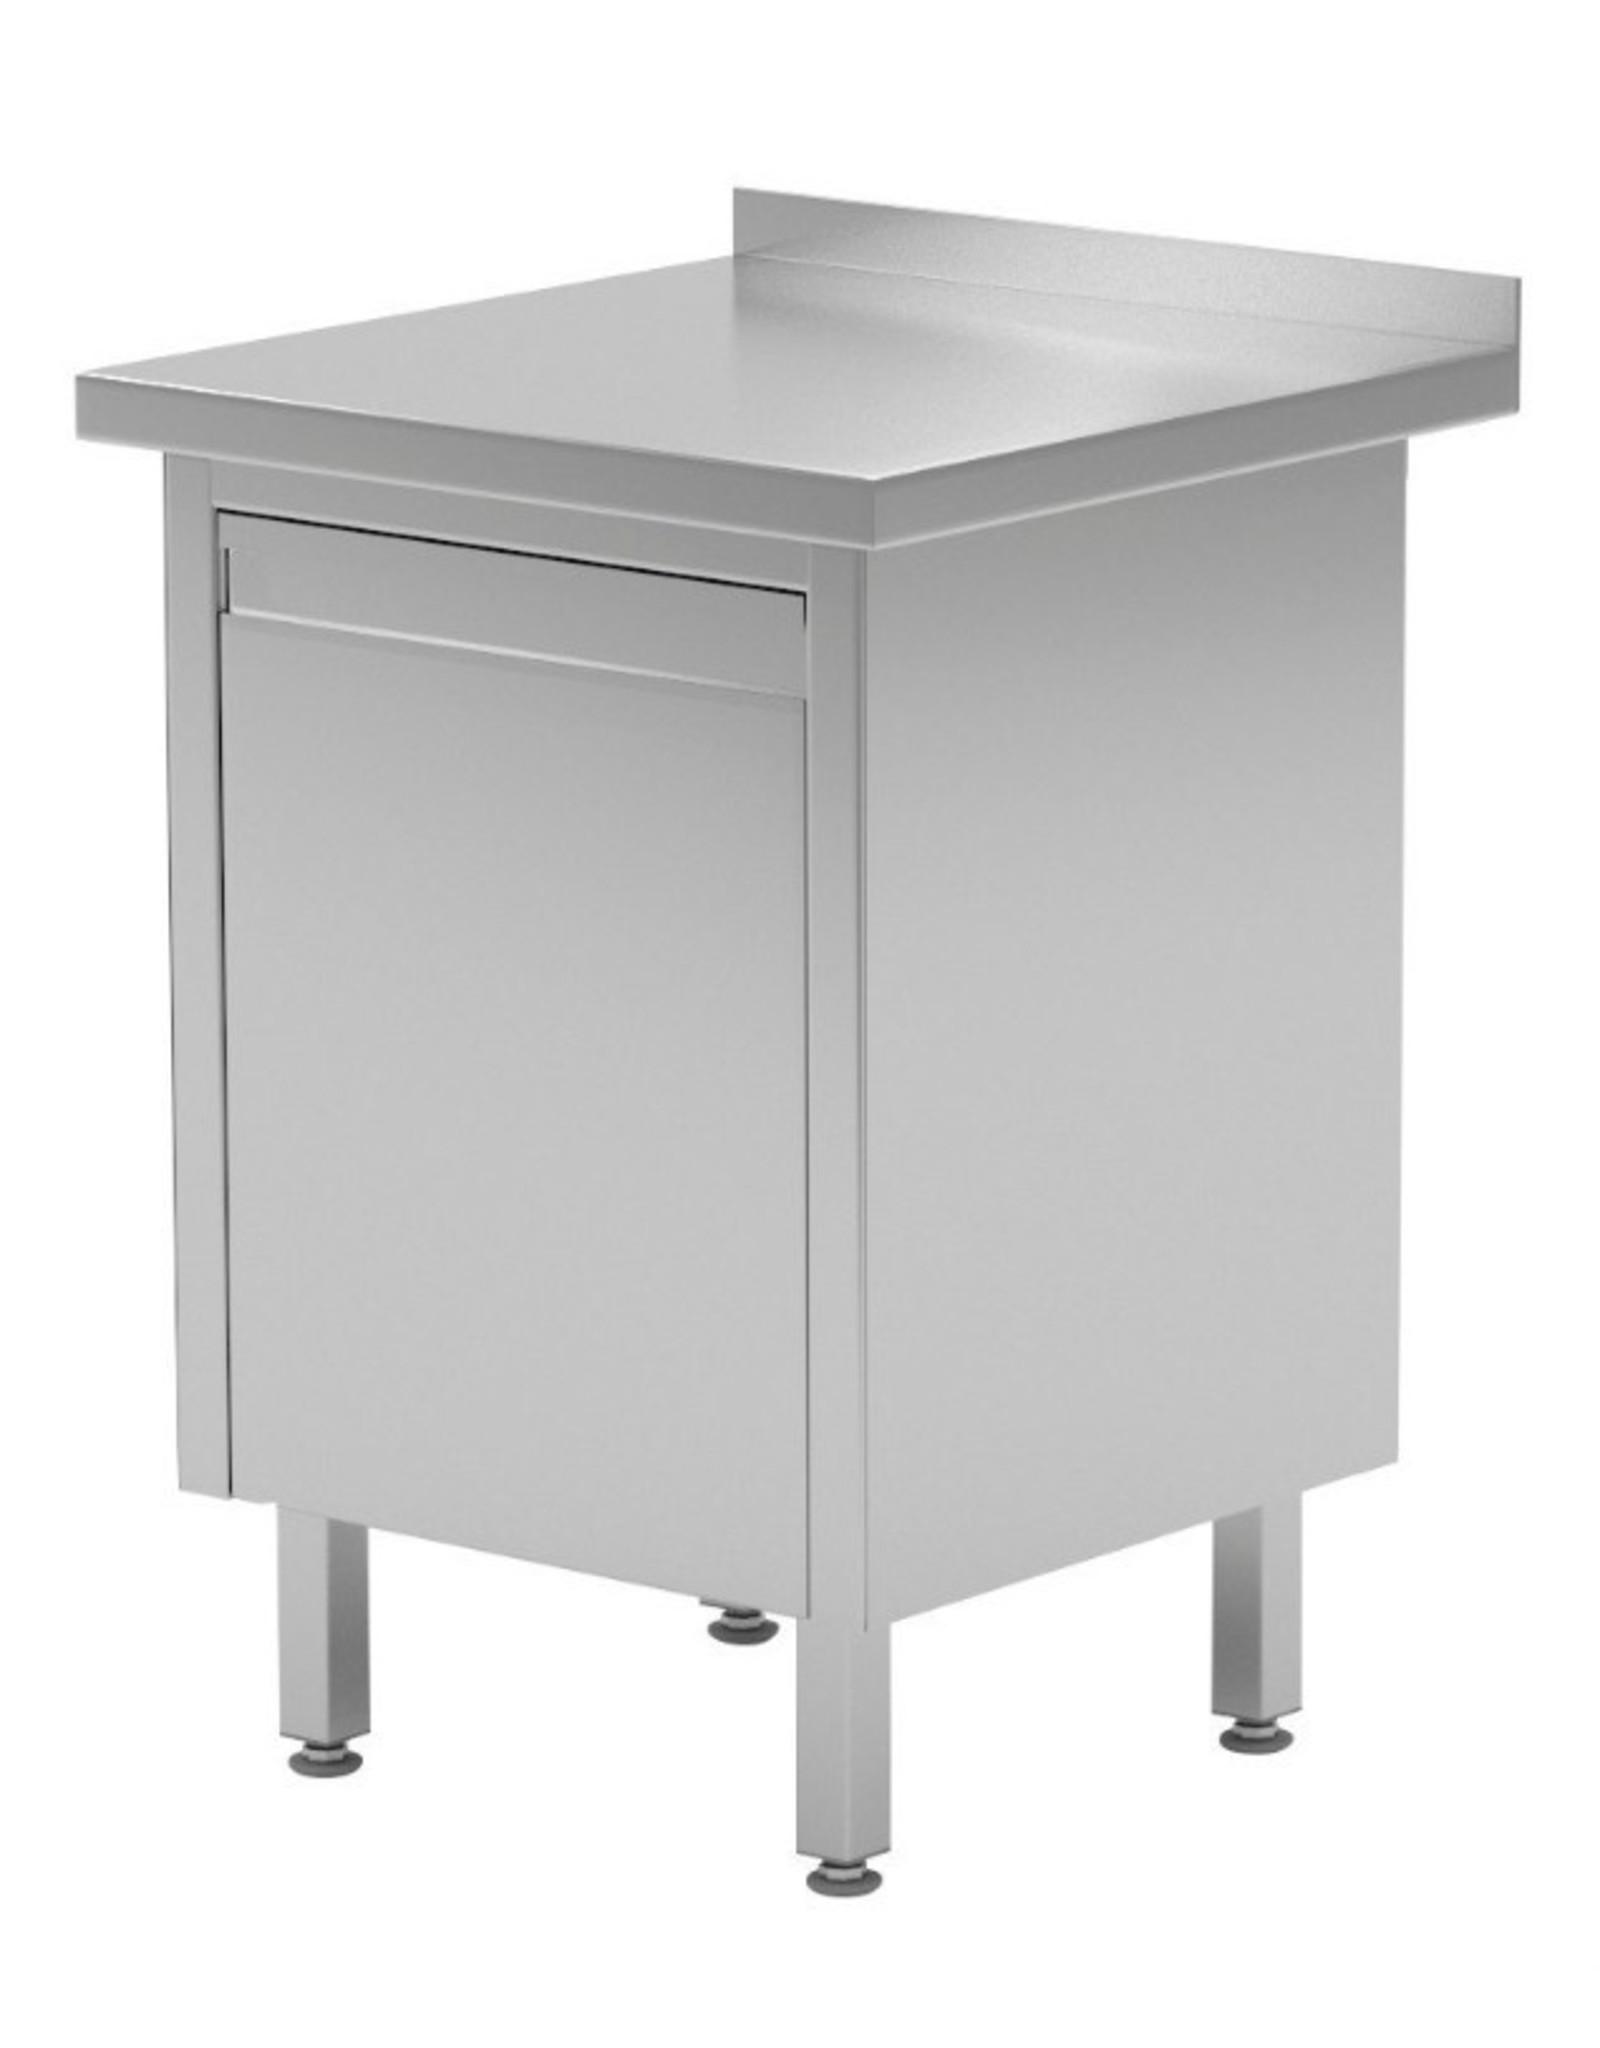 Werktafel met kantelbare prullenbak | 430mm breed | 600 of 700mm diep